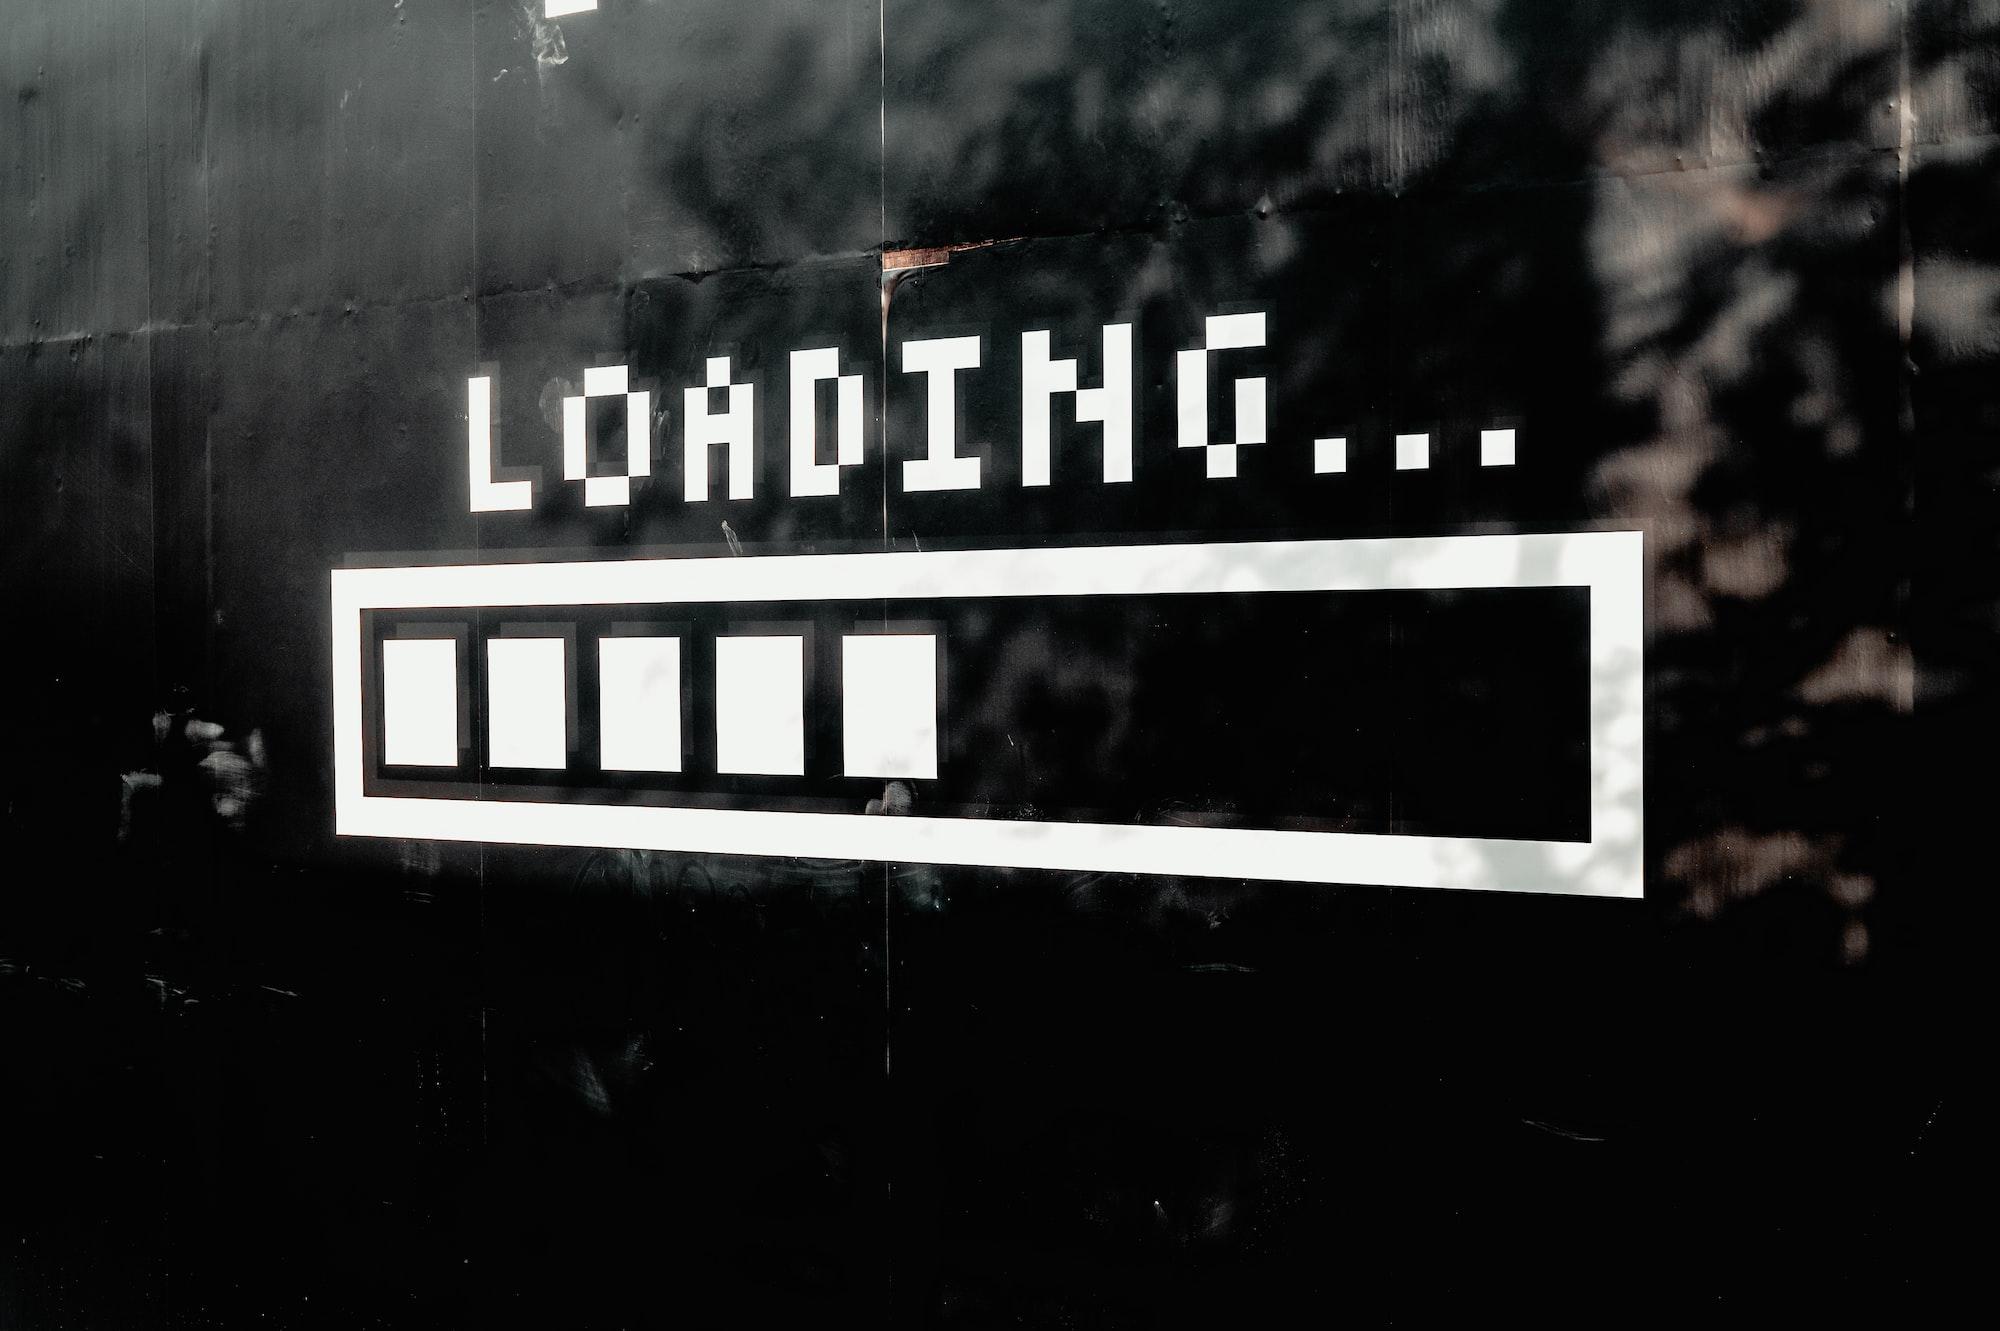 Website Hacks For 10X Faster Loading and 100% Uptime